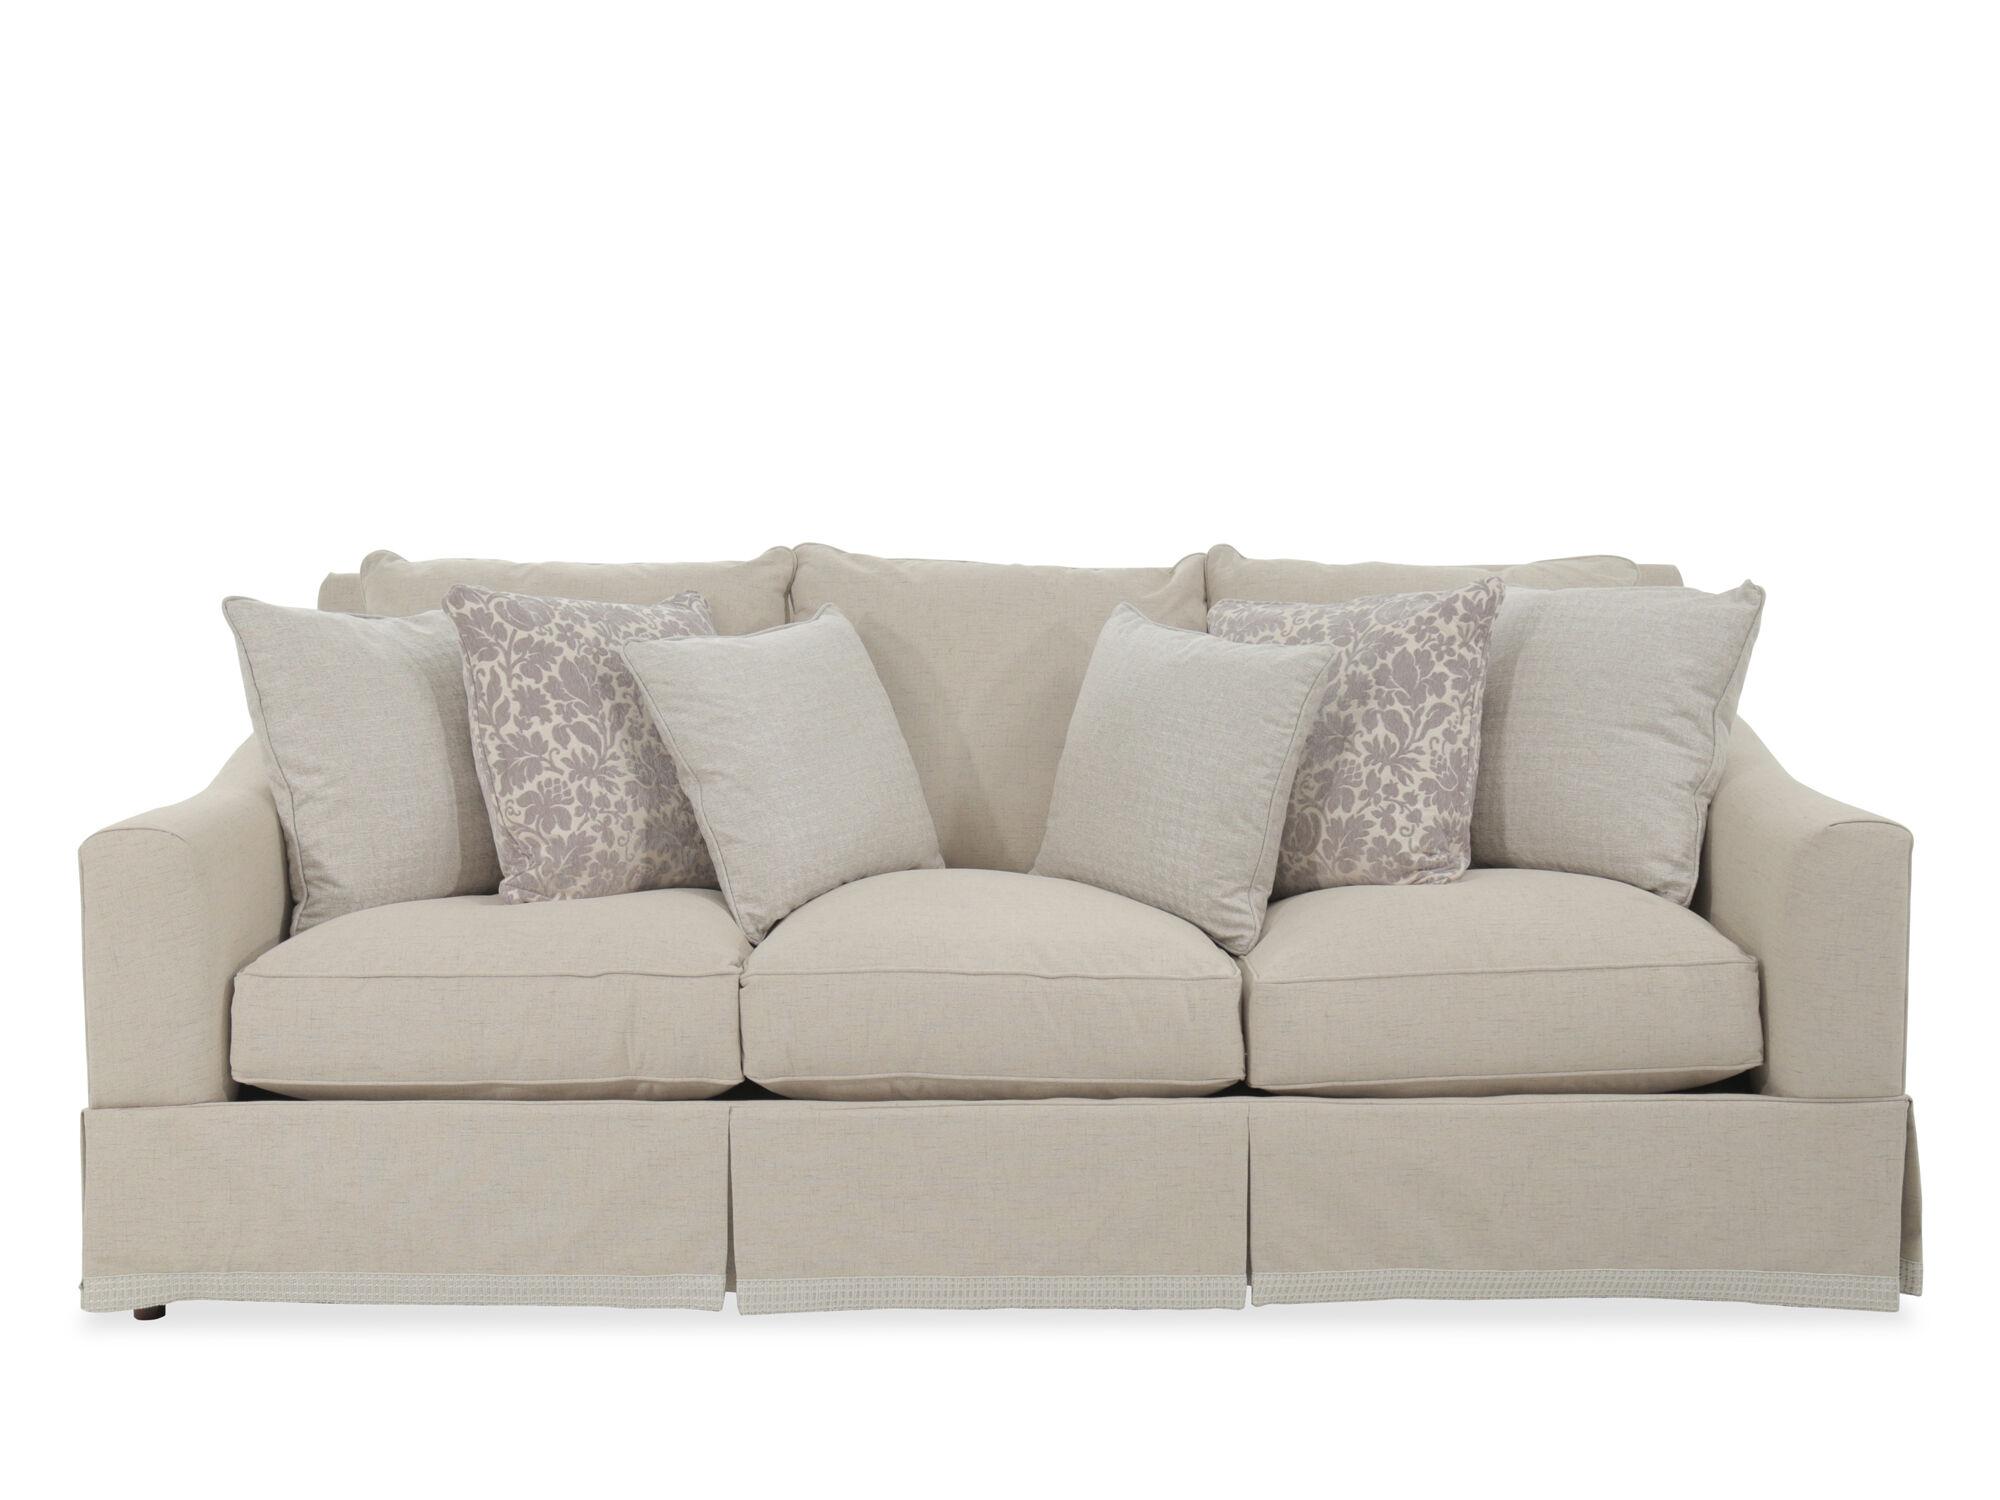 Beau Images Traditional 98u0026quot; Skirted Sofa ...